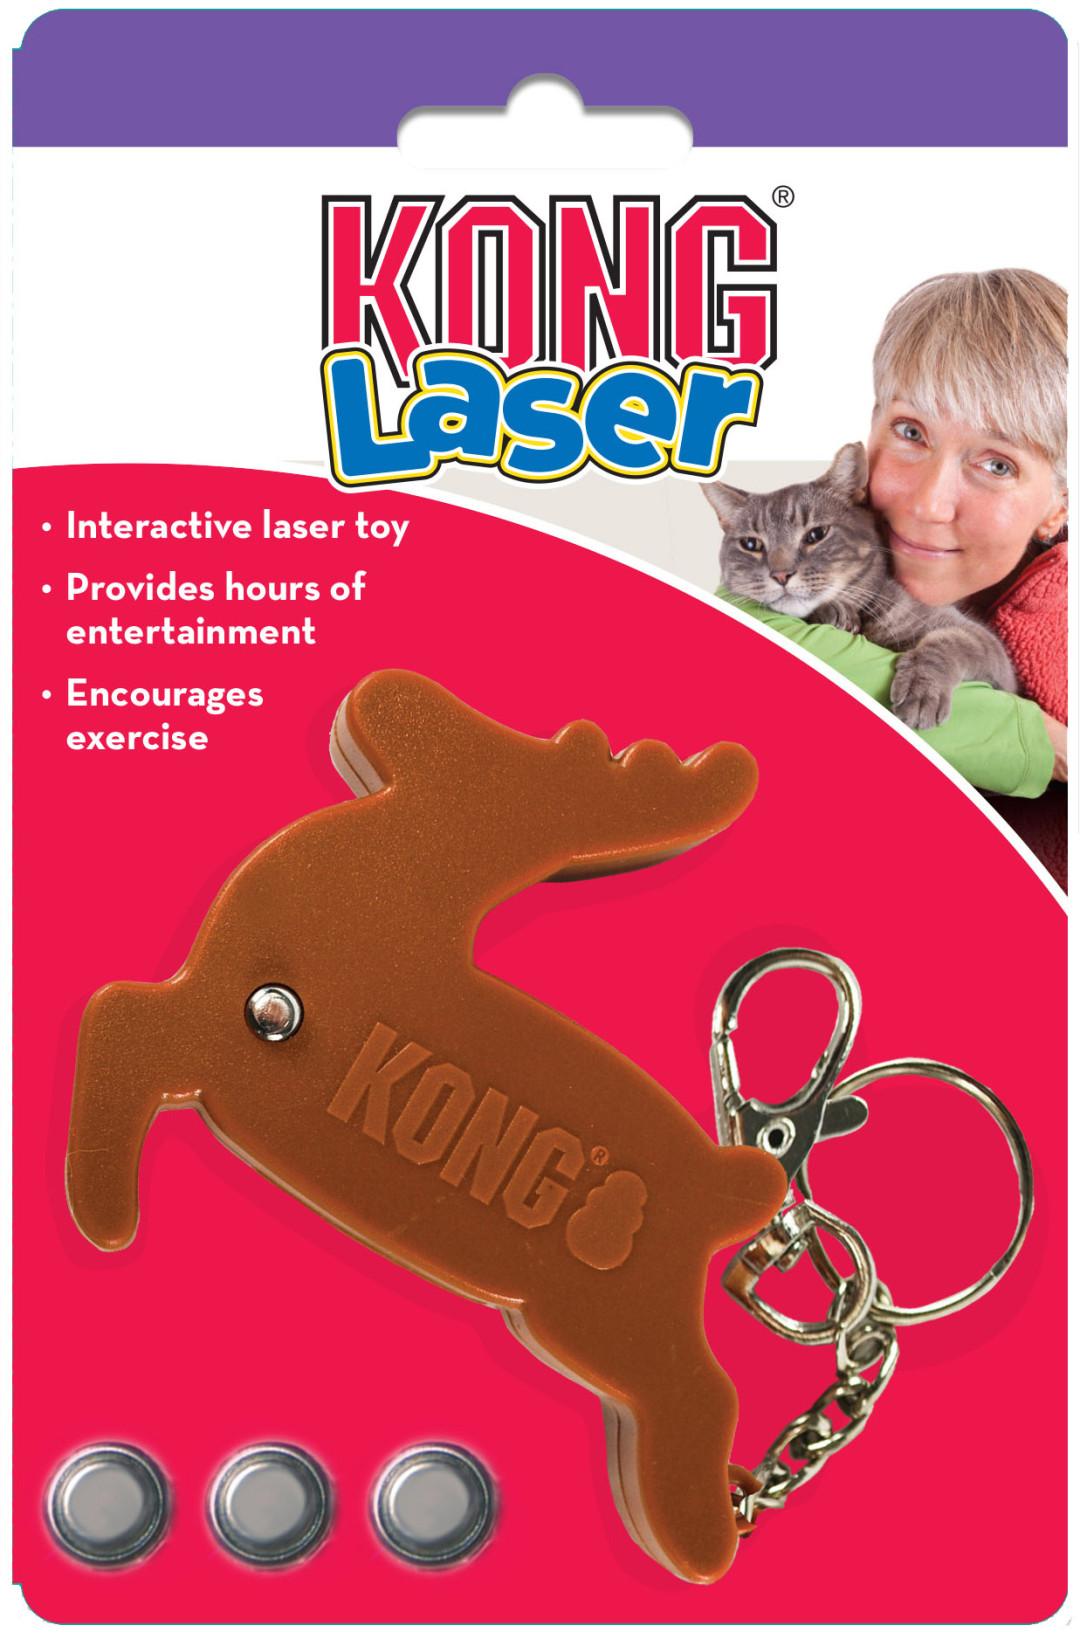 Kong Laser reindeer